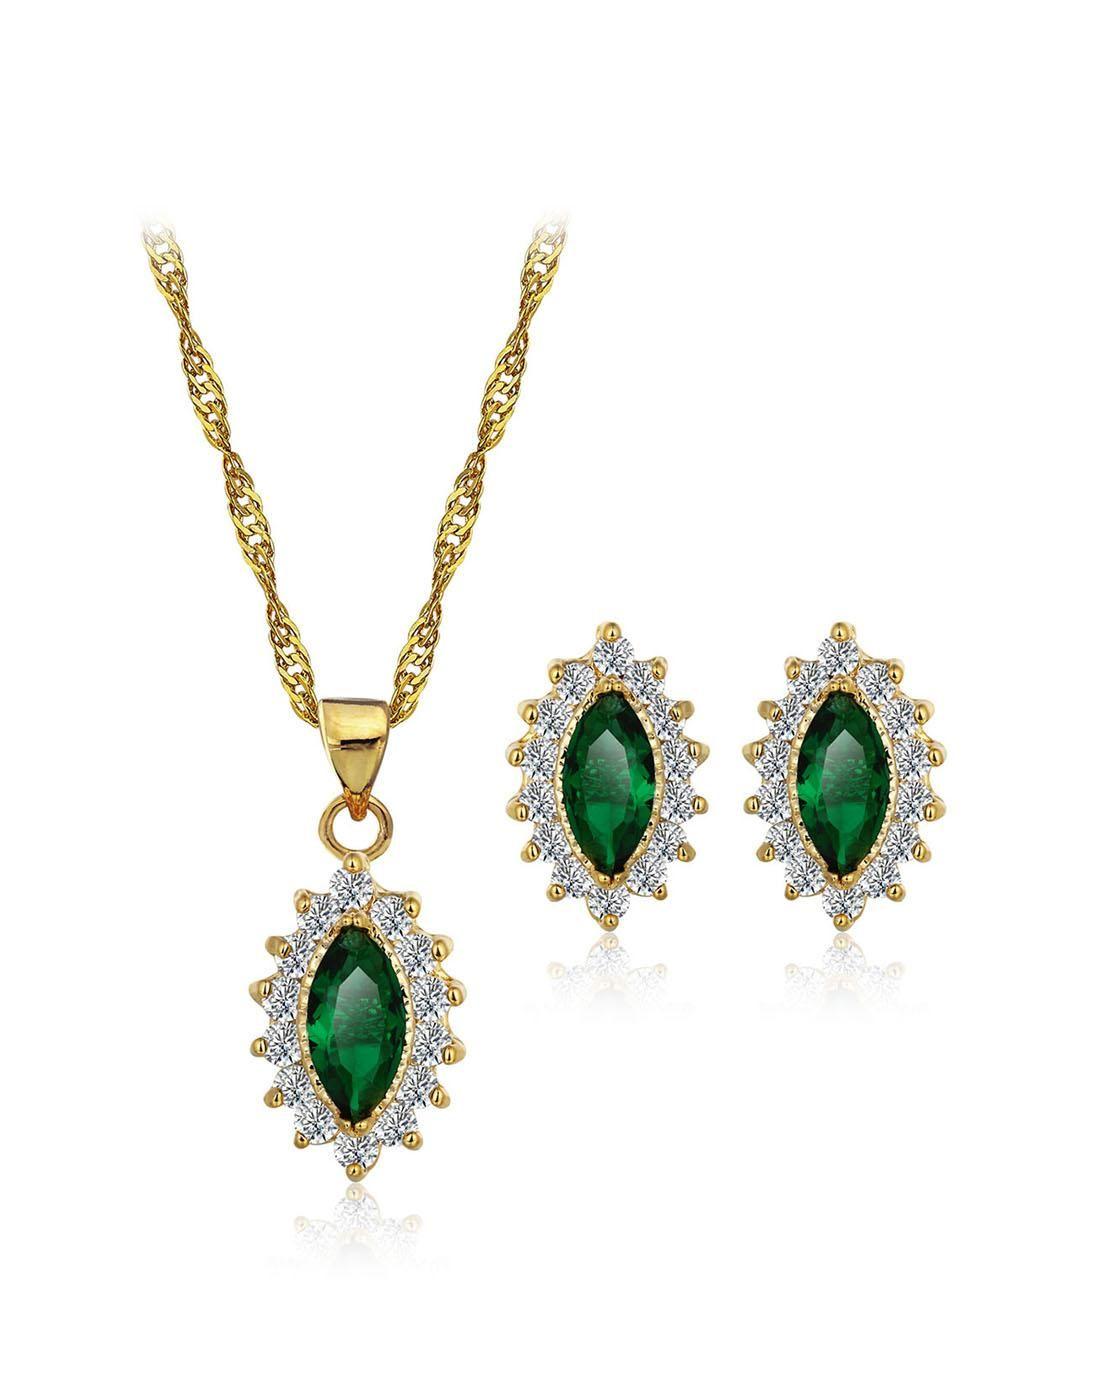 Adorewe vipme jewelry sets jewelora emerald green charm zircon